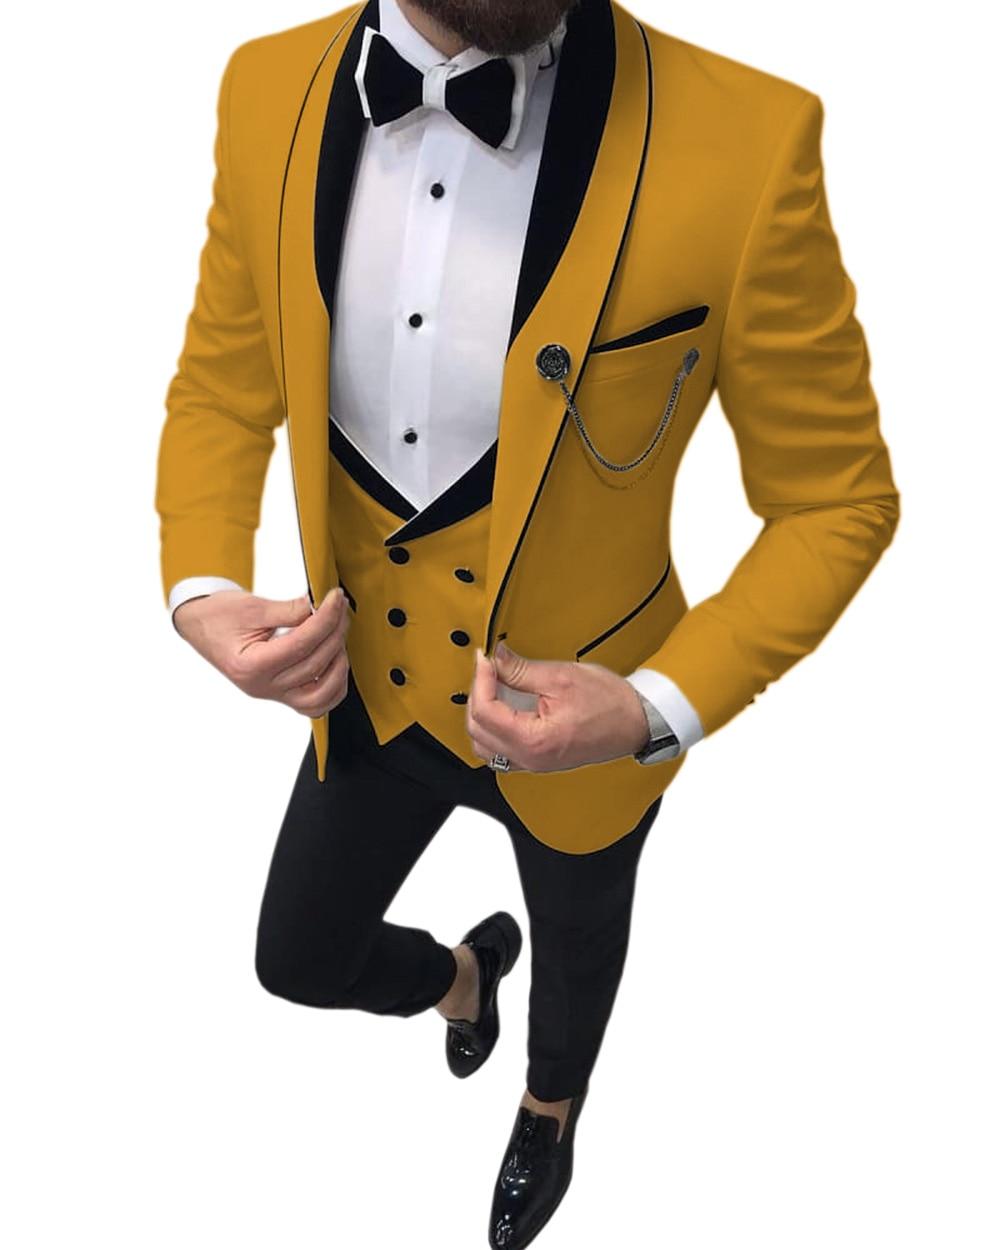 Men's Suits Slim Fit 3 Piece Prom Tuxedos Shawl Lapel Double Breasted Vest Tuxedos Blazer Wedding Party (Blazer+vest+Pants)